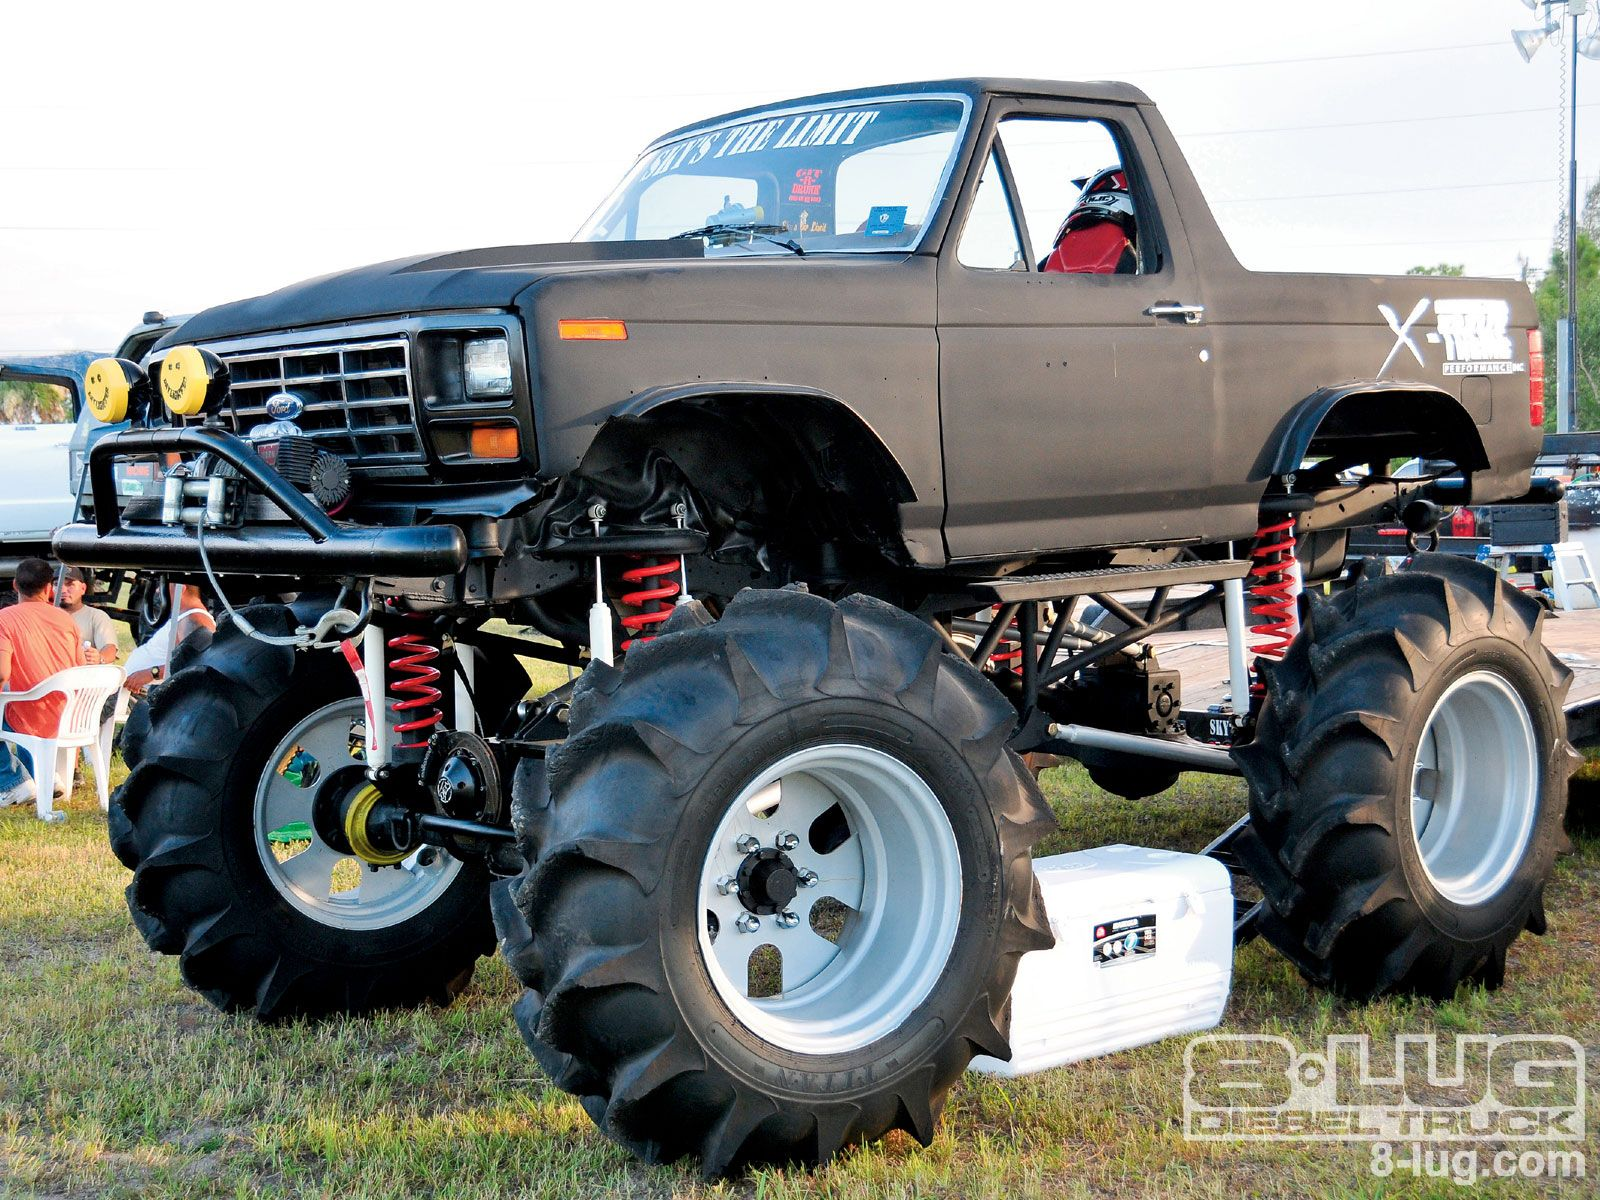 Lifted chevy show trucks 2103 texas heatwave truck show - Funny Lifted Truck Quotes Lifted Chevy Silverado Trucks